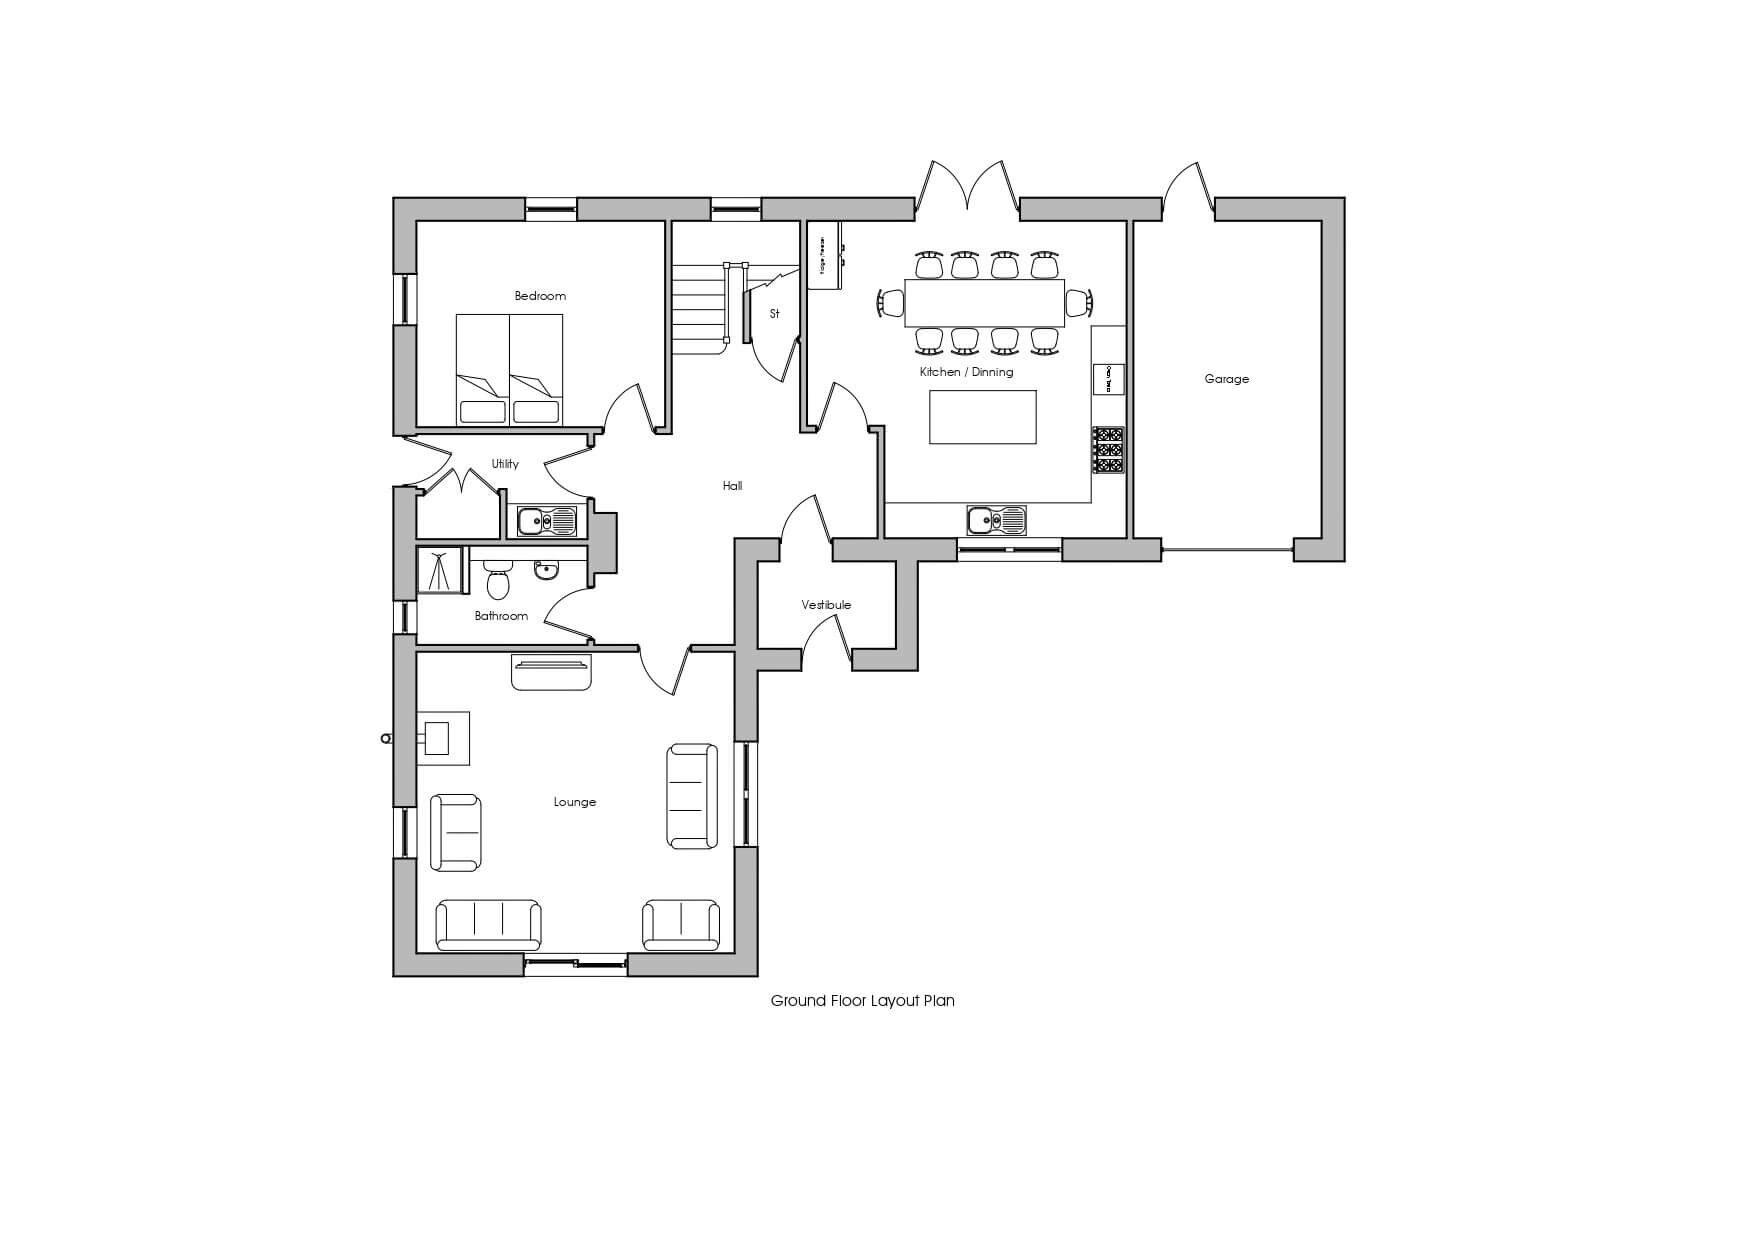 Red-Gauntlet-Ground-Floor-Plan-2019.jpg